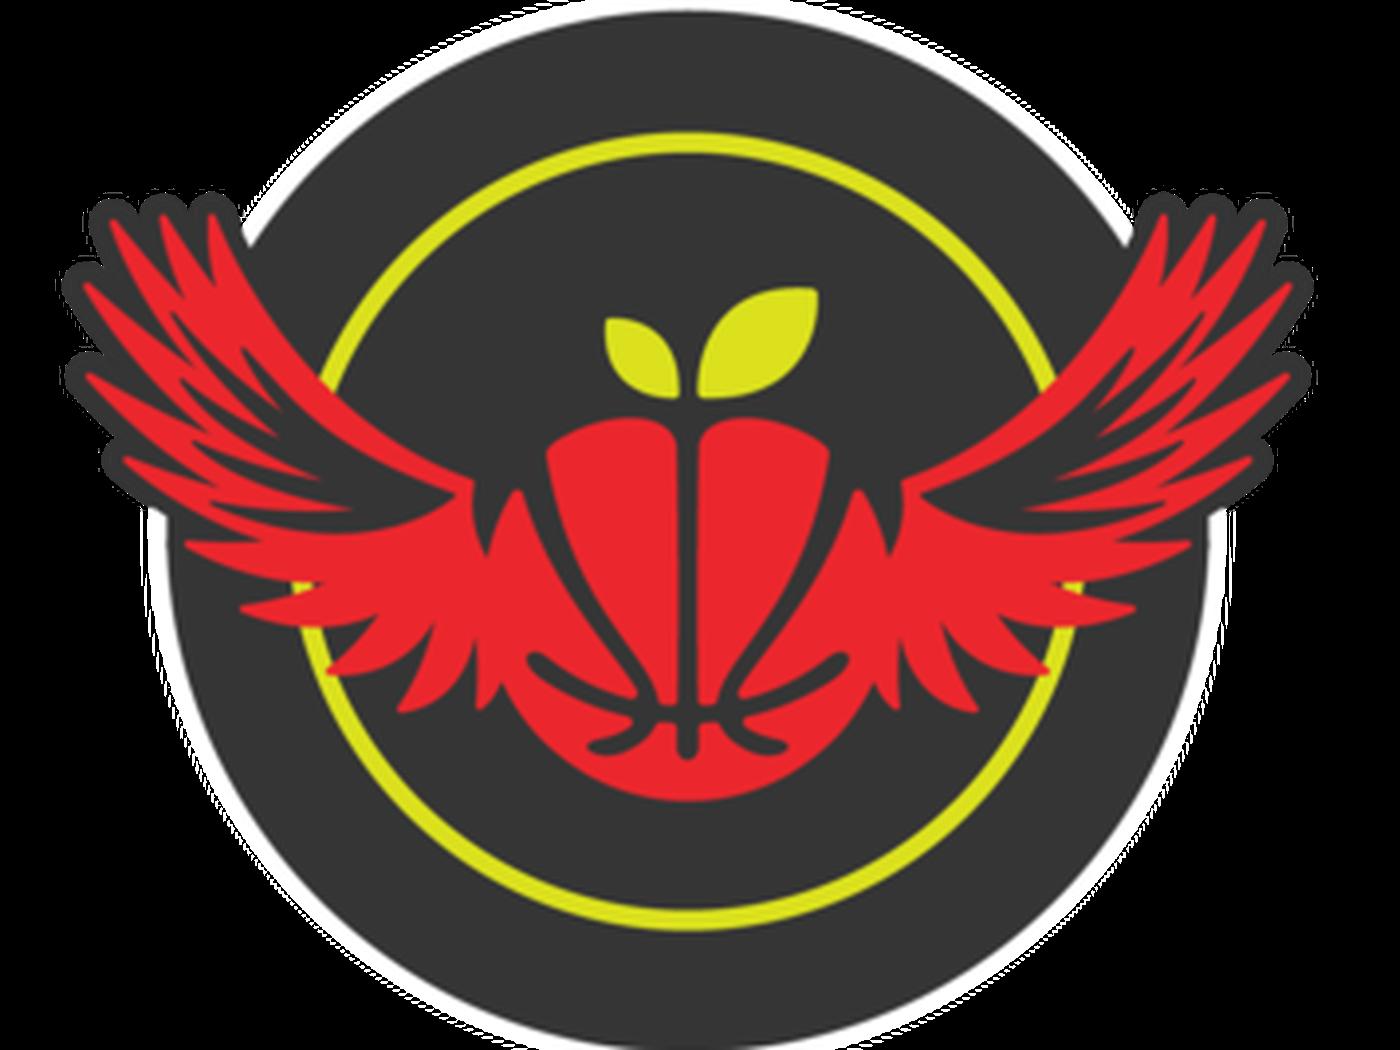 Atlanta Hawks Maurice Evans Talks About Nba Labor Negotiations Peachtree Hoops